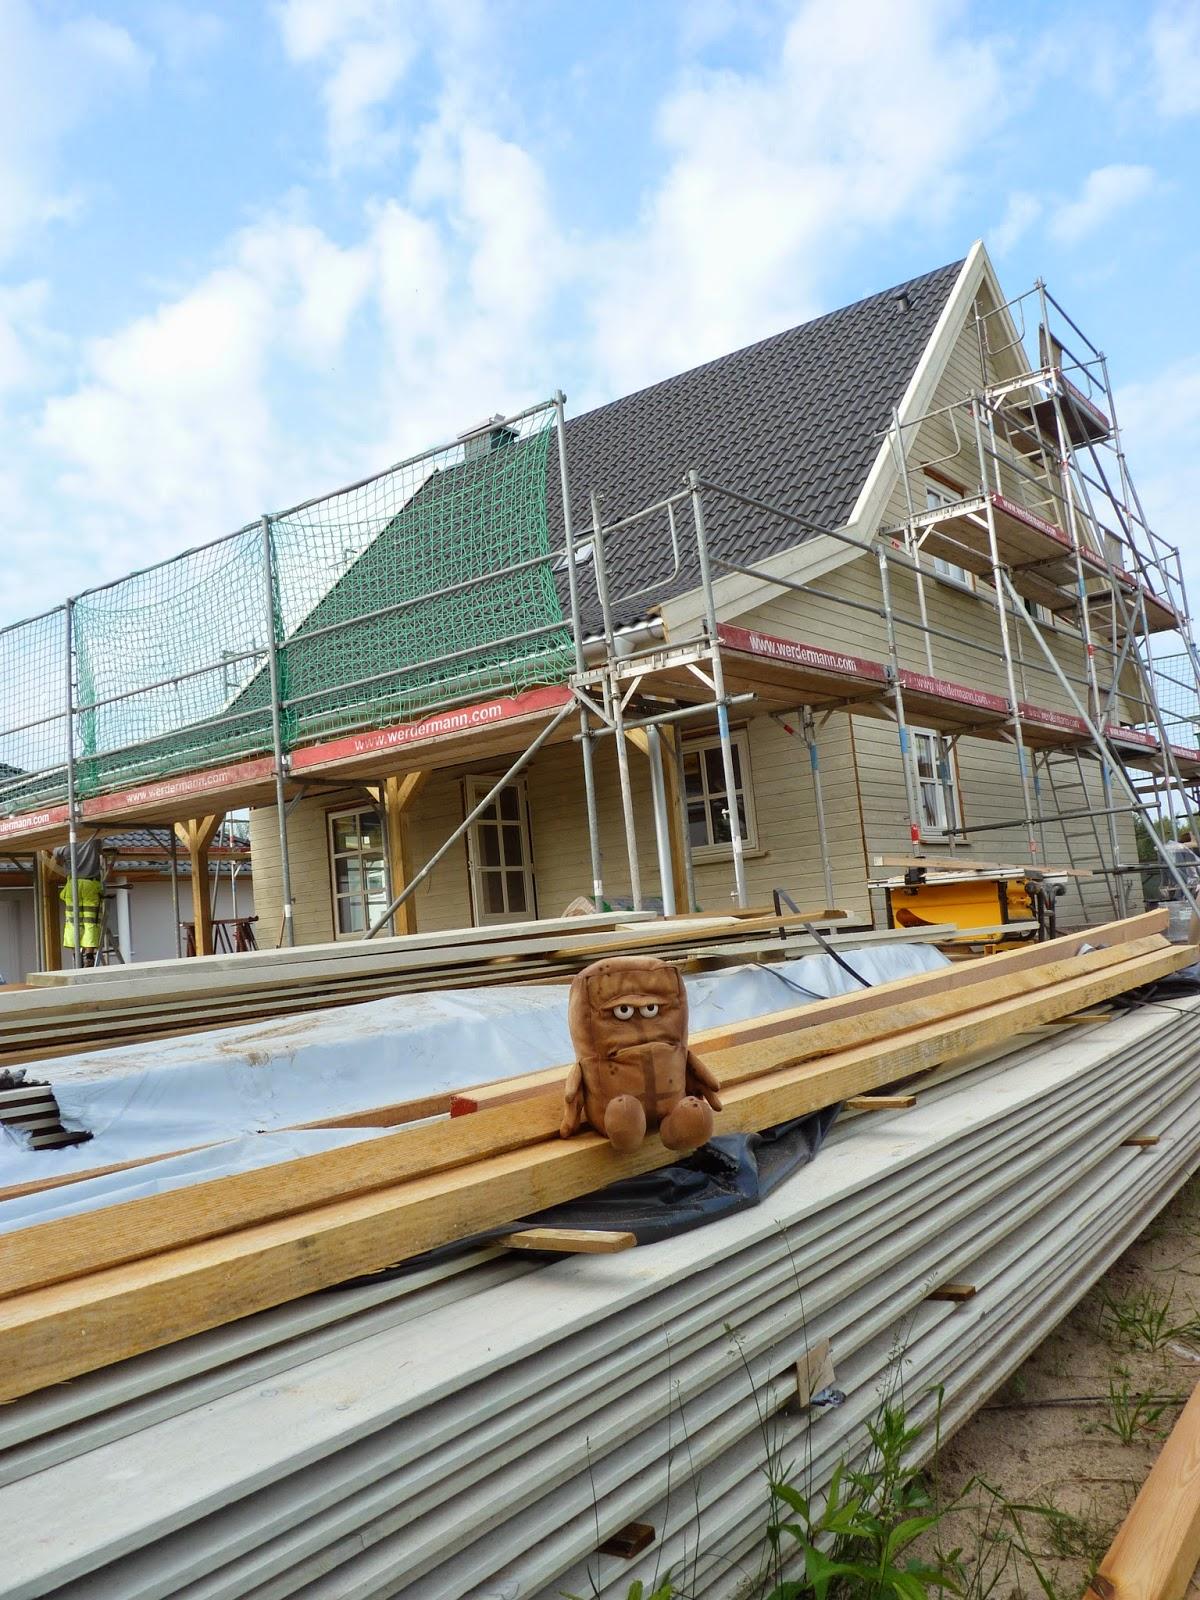 Haus Rohbau Awesome Haus Rohbau With Haus Rohbau Best